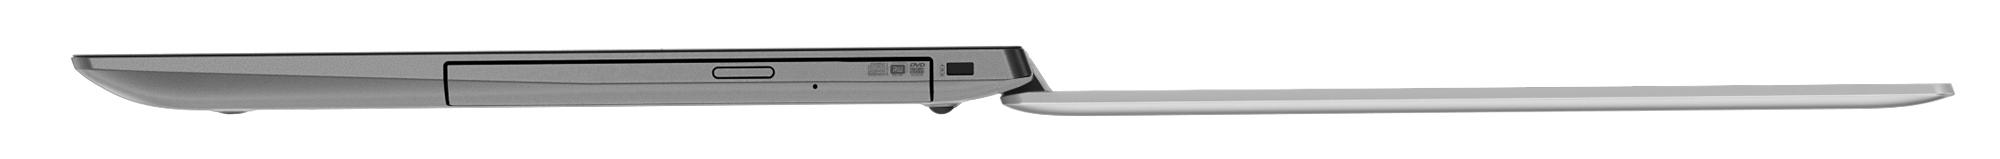 Фото  Ноутбук Lenovo ideapad 330-15 Platinum Grey (81DC00RPRA)